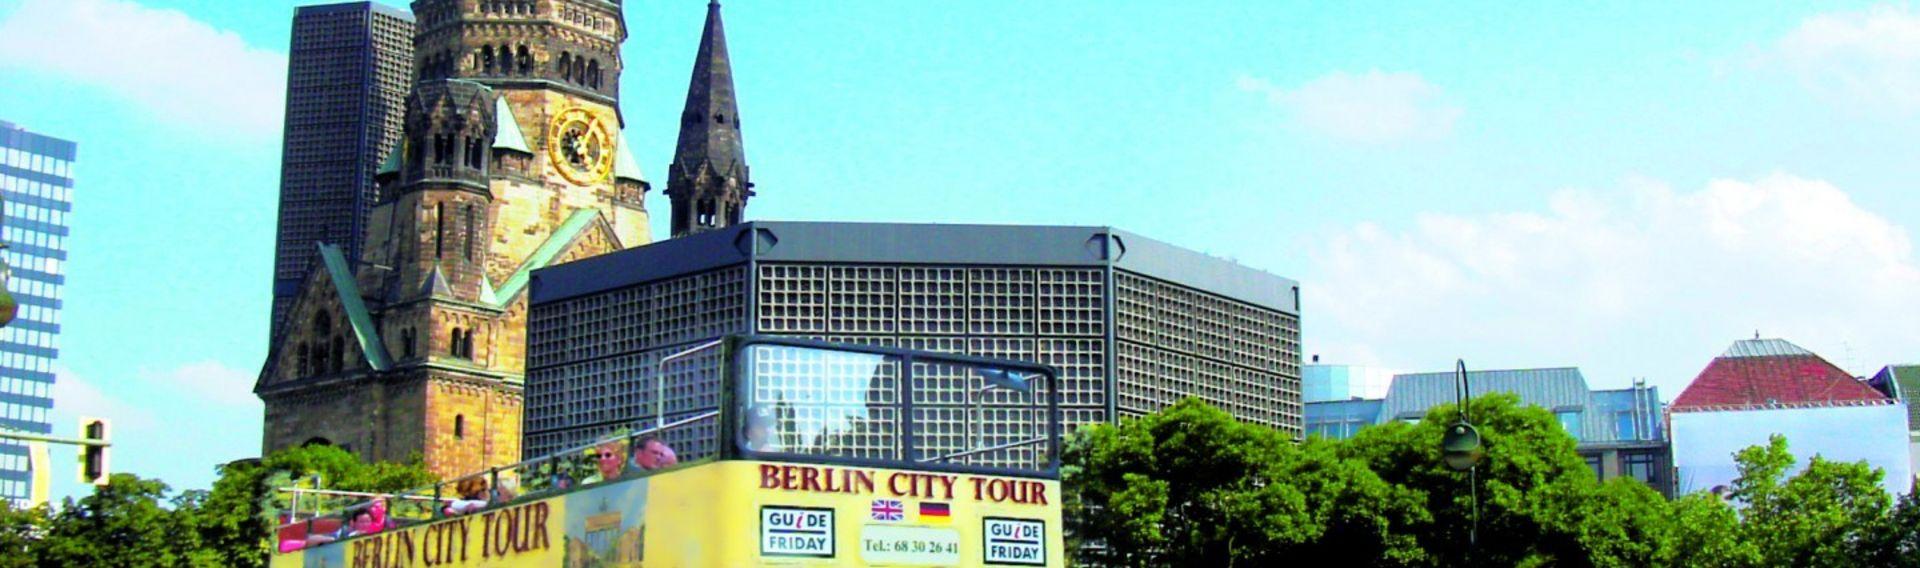 Berlin Stadtrundfahrt offener Bus